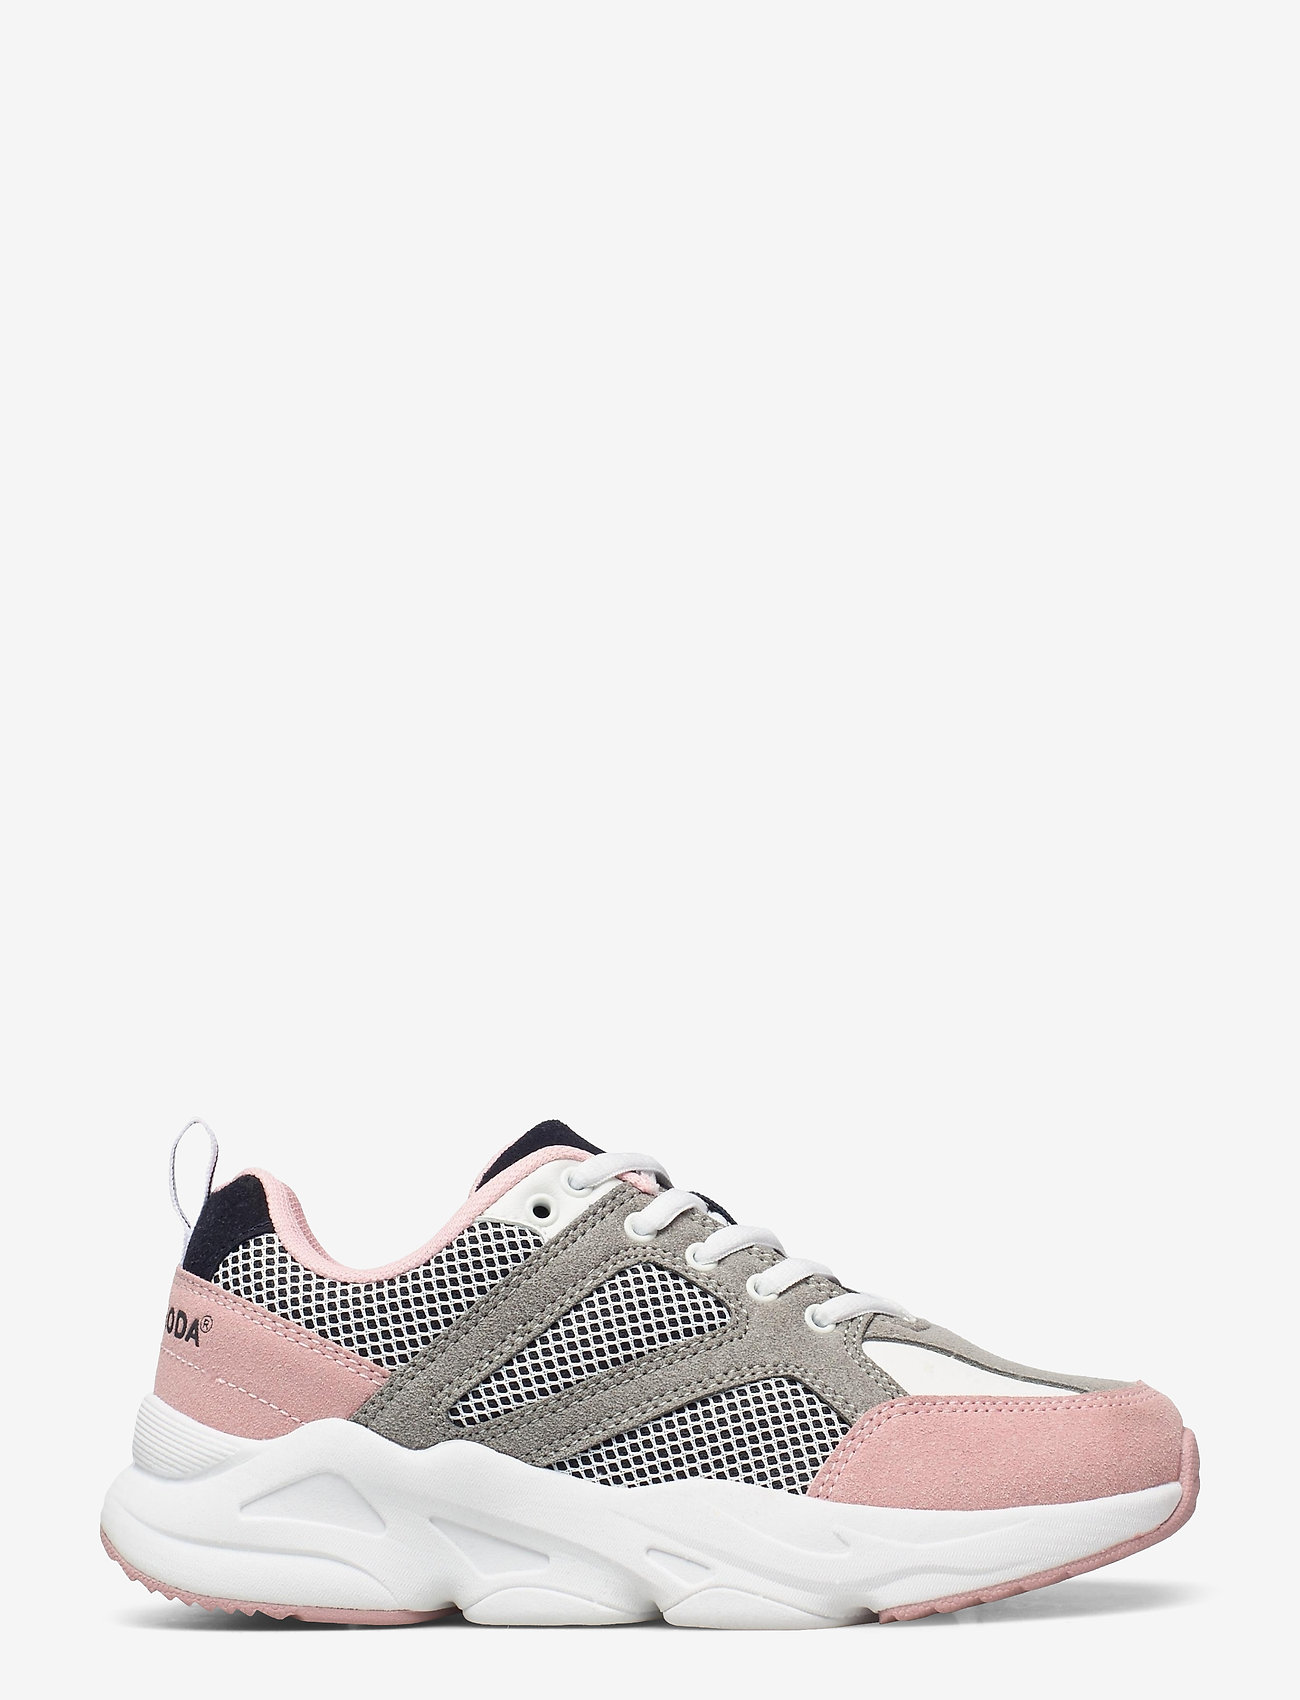 Vero Moda - VMATEA SNEAKER - chunky sneakers - sepia rose - 1